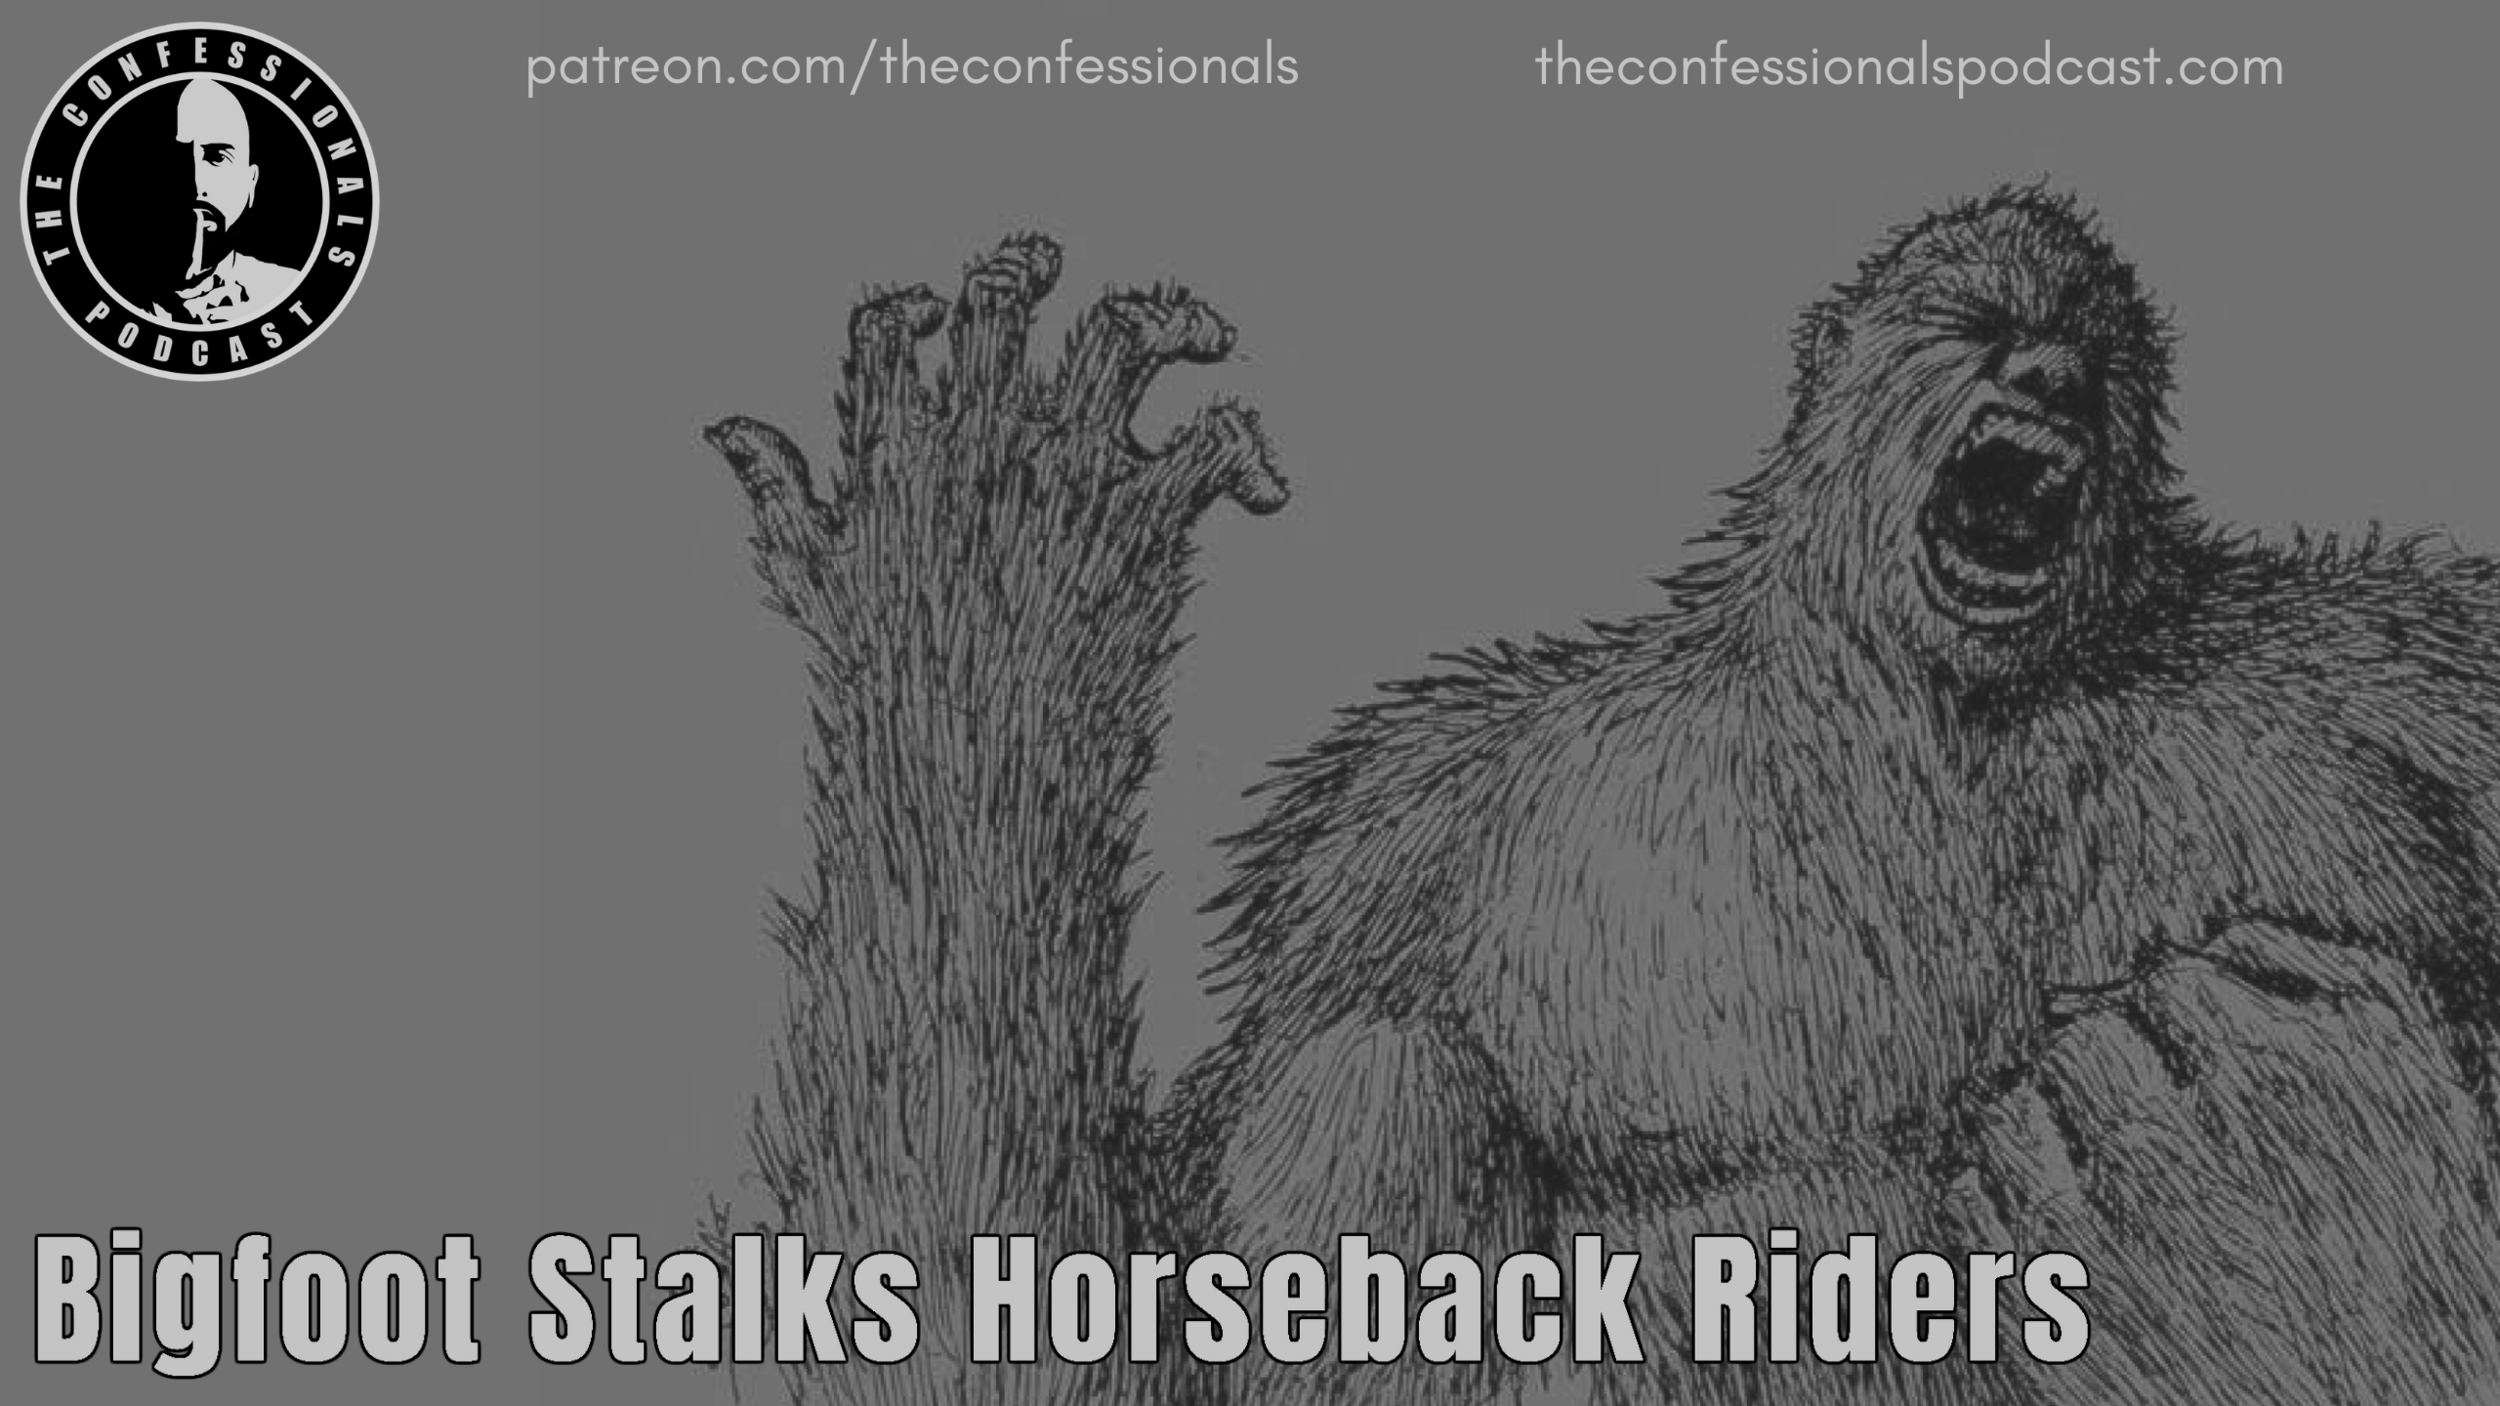 Bigfoot Stalking Horse Riders (1).png